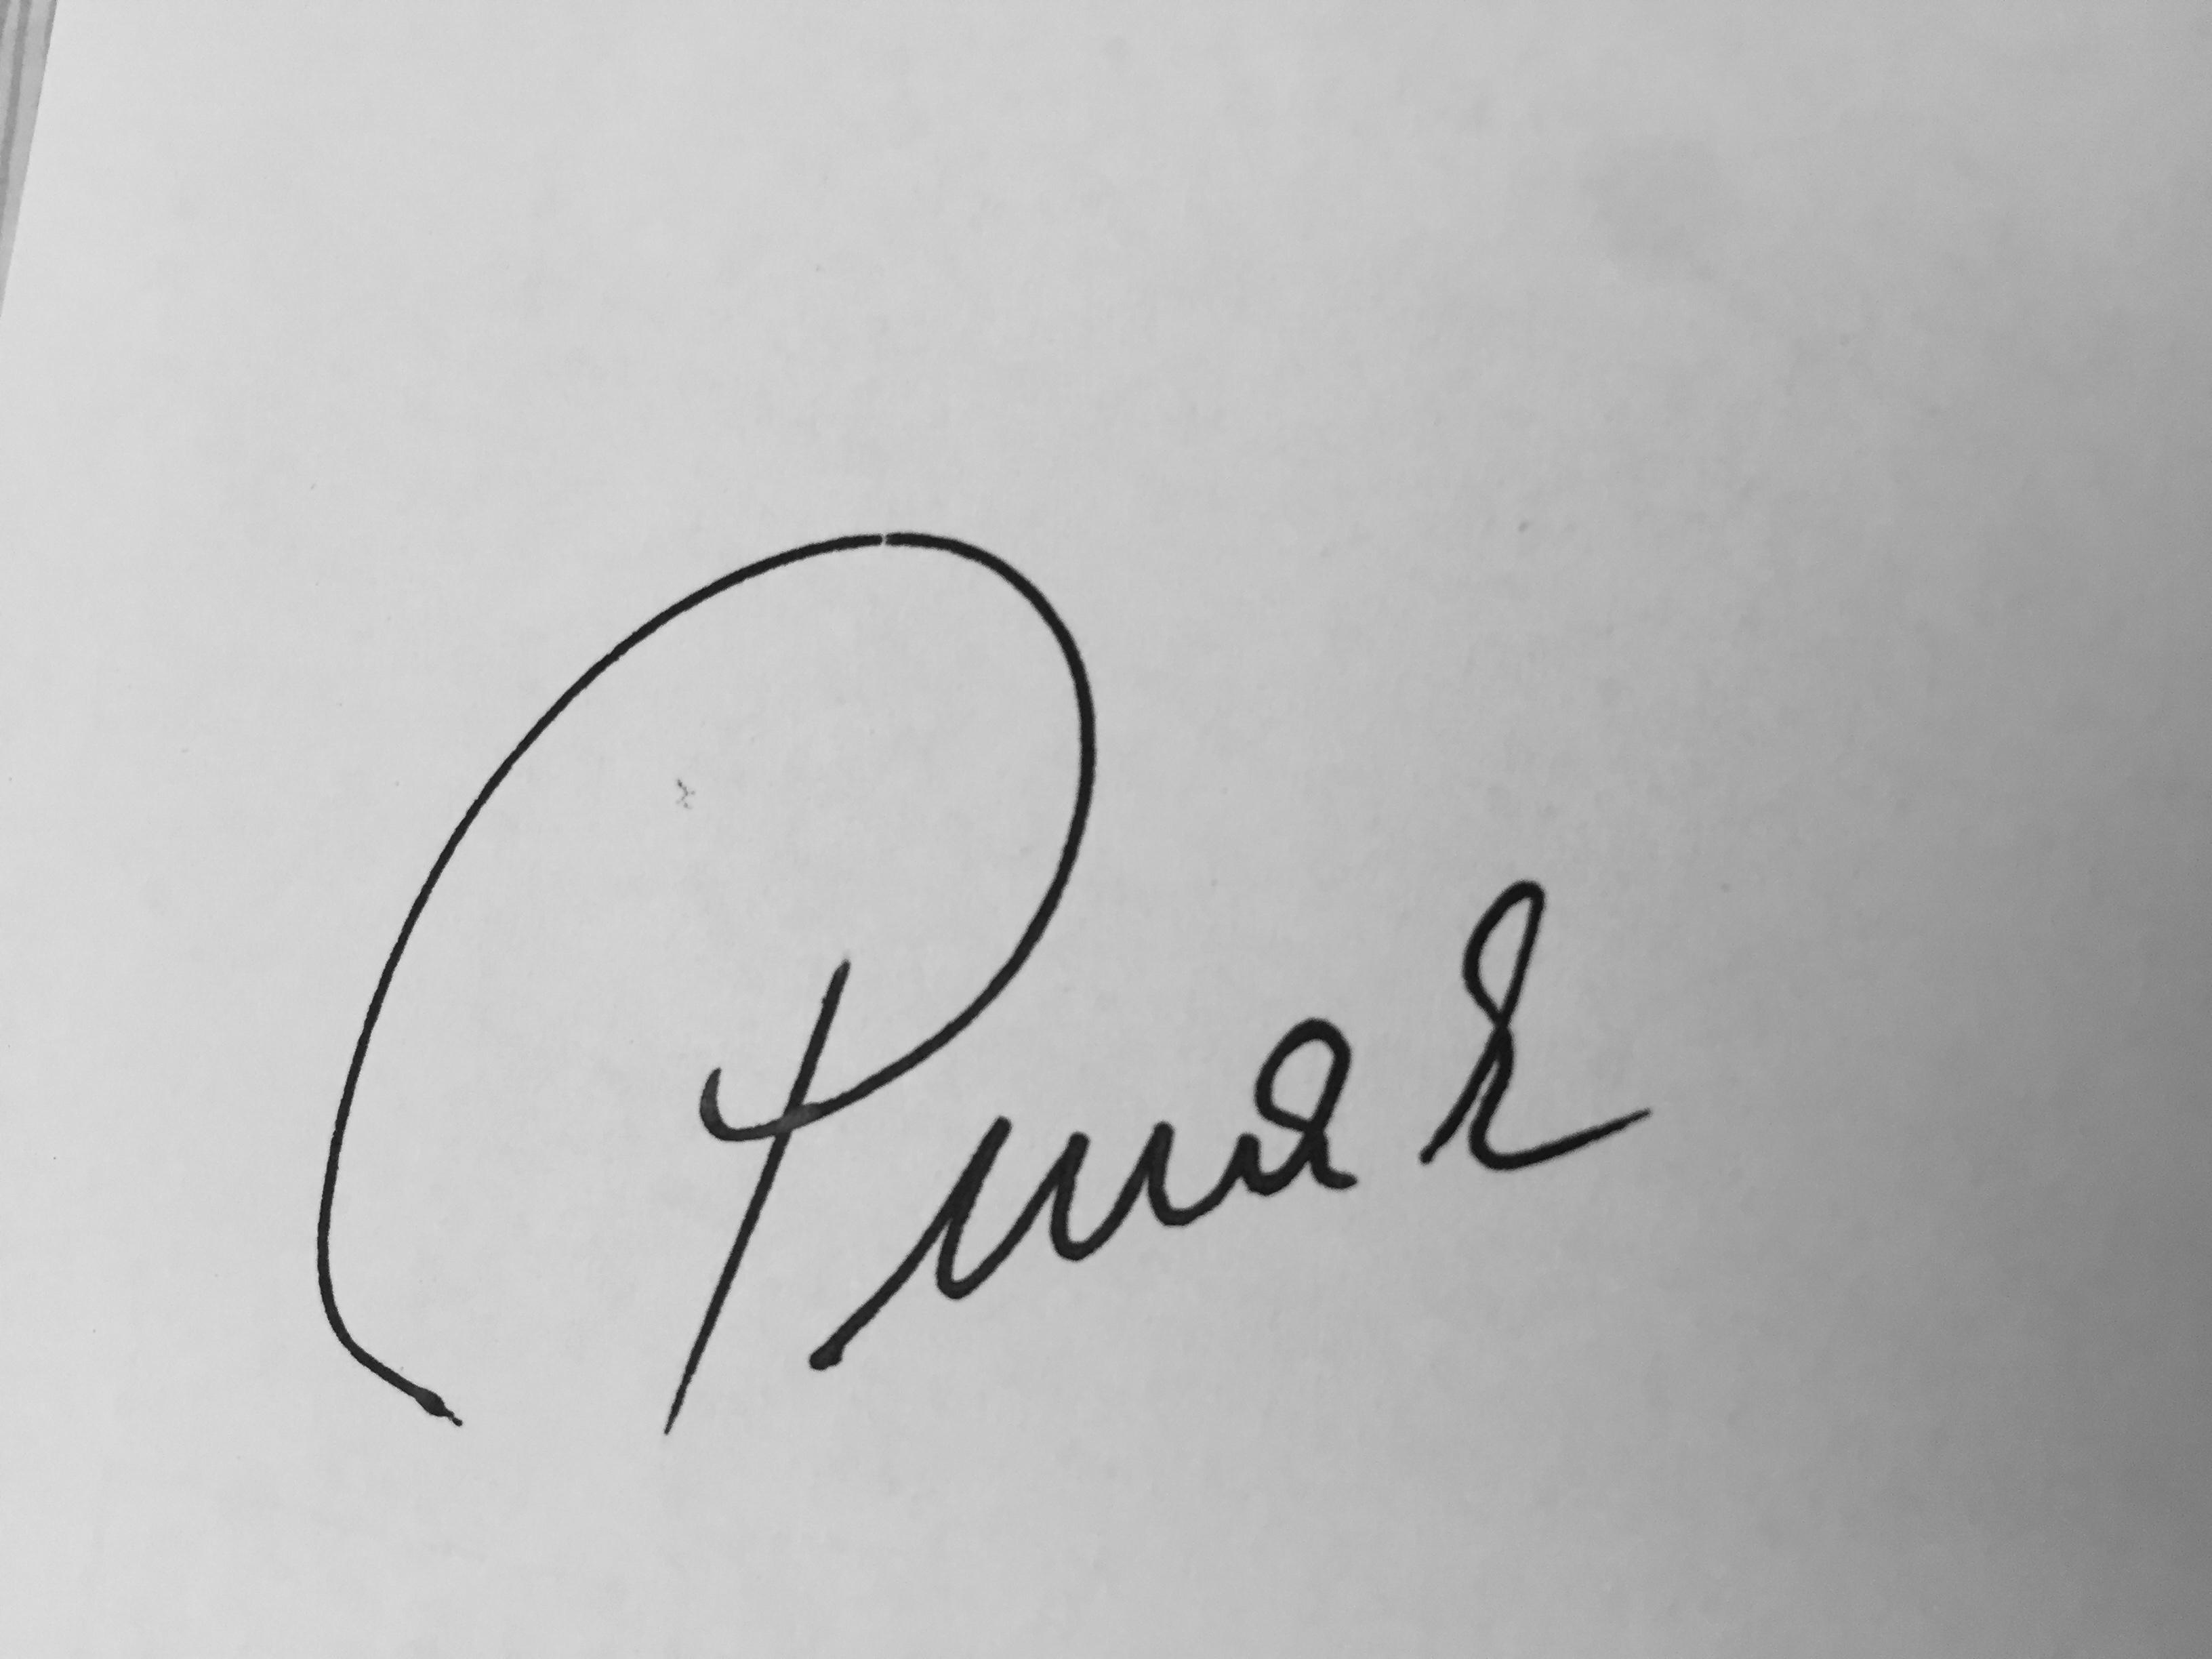 pinar ervardar Signature